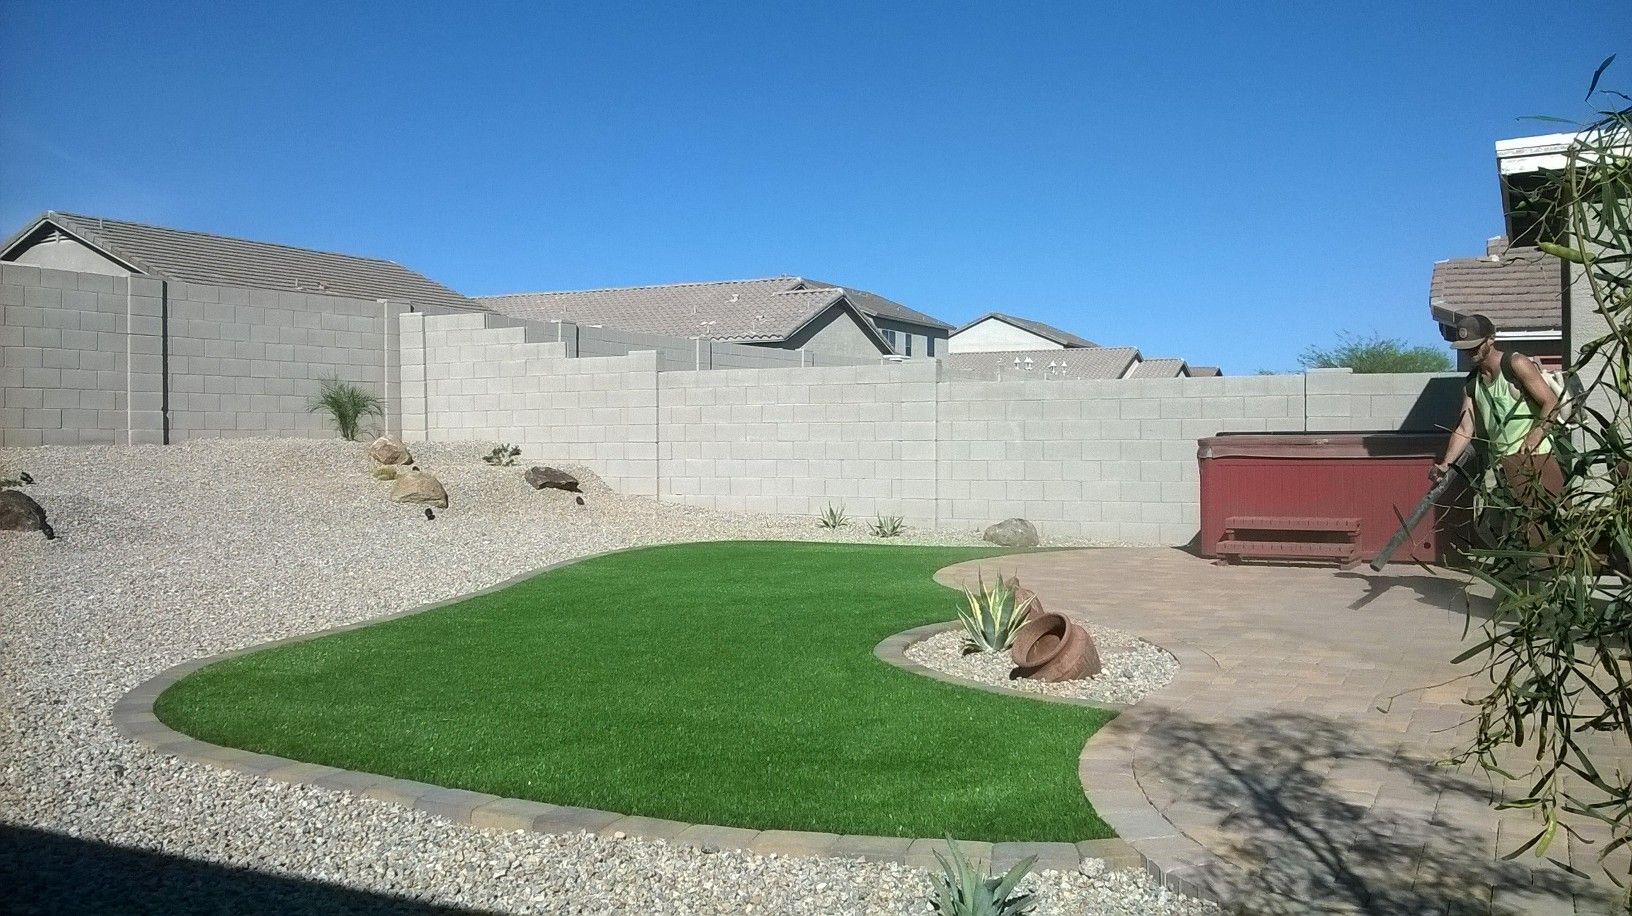 Arizona Cost Effective Backyard Designs No Grass Google Search